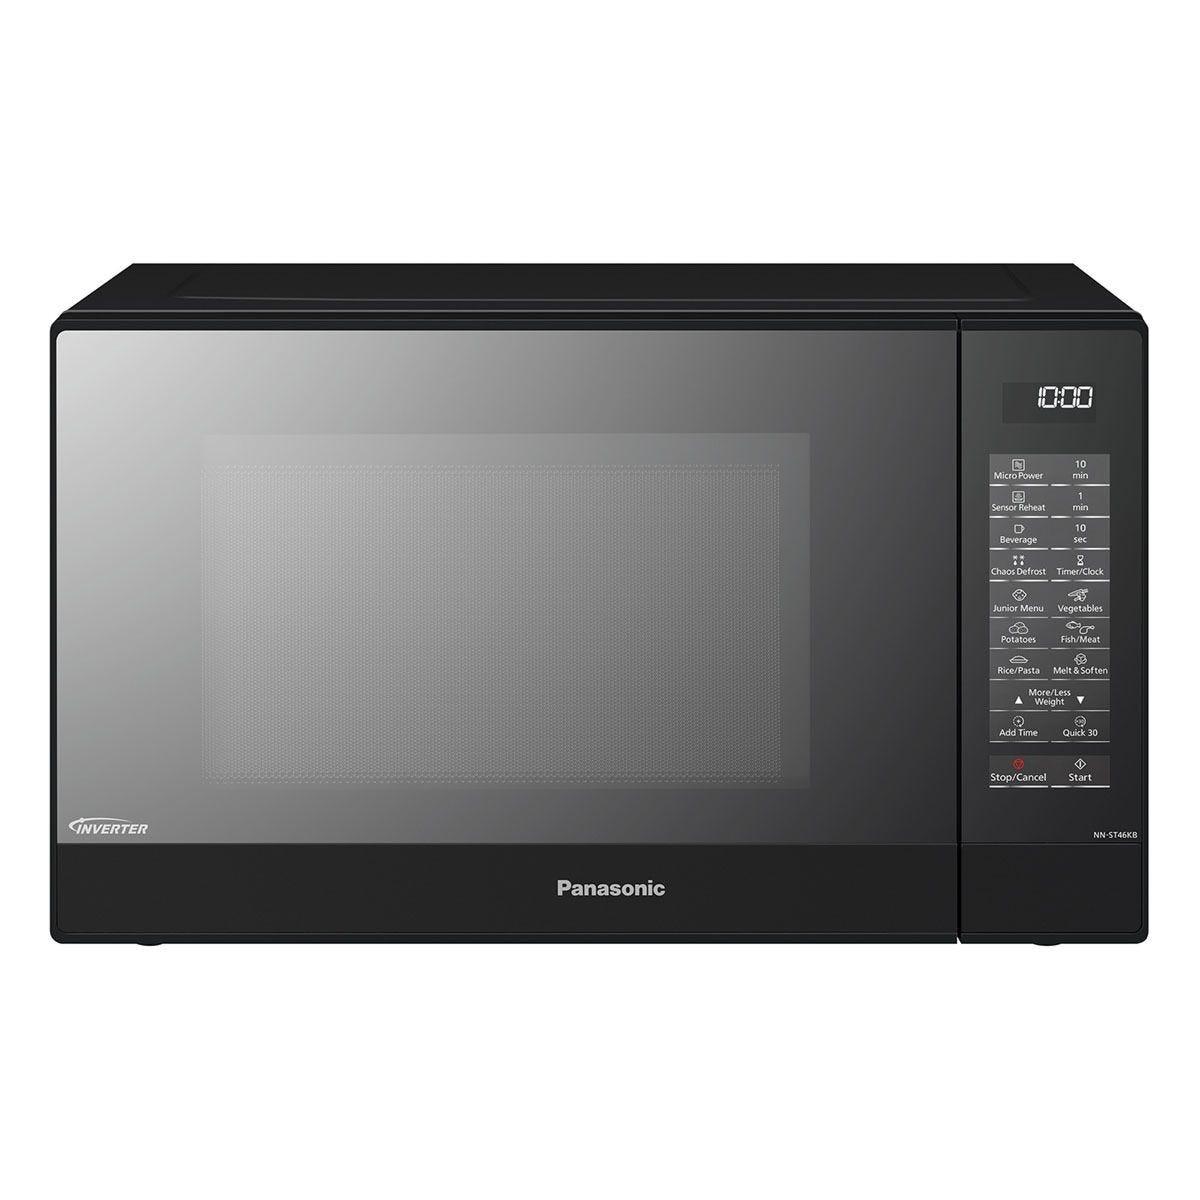 Panasonic NN-ST46KBBPQ 32L 1000W Solo Microwave - Black